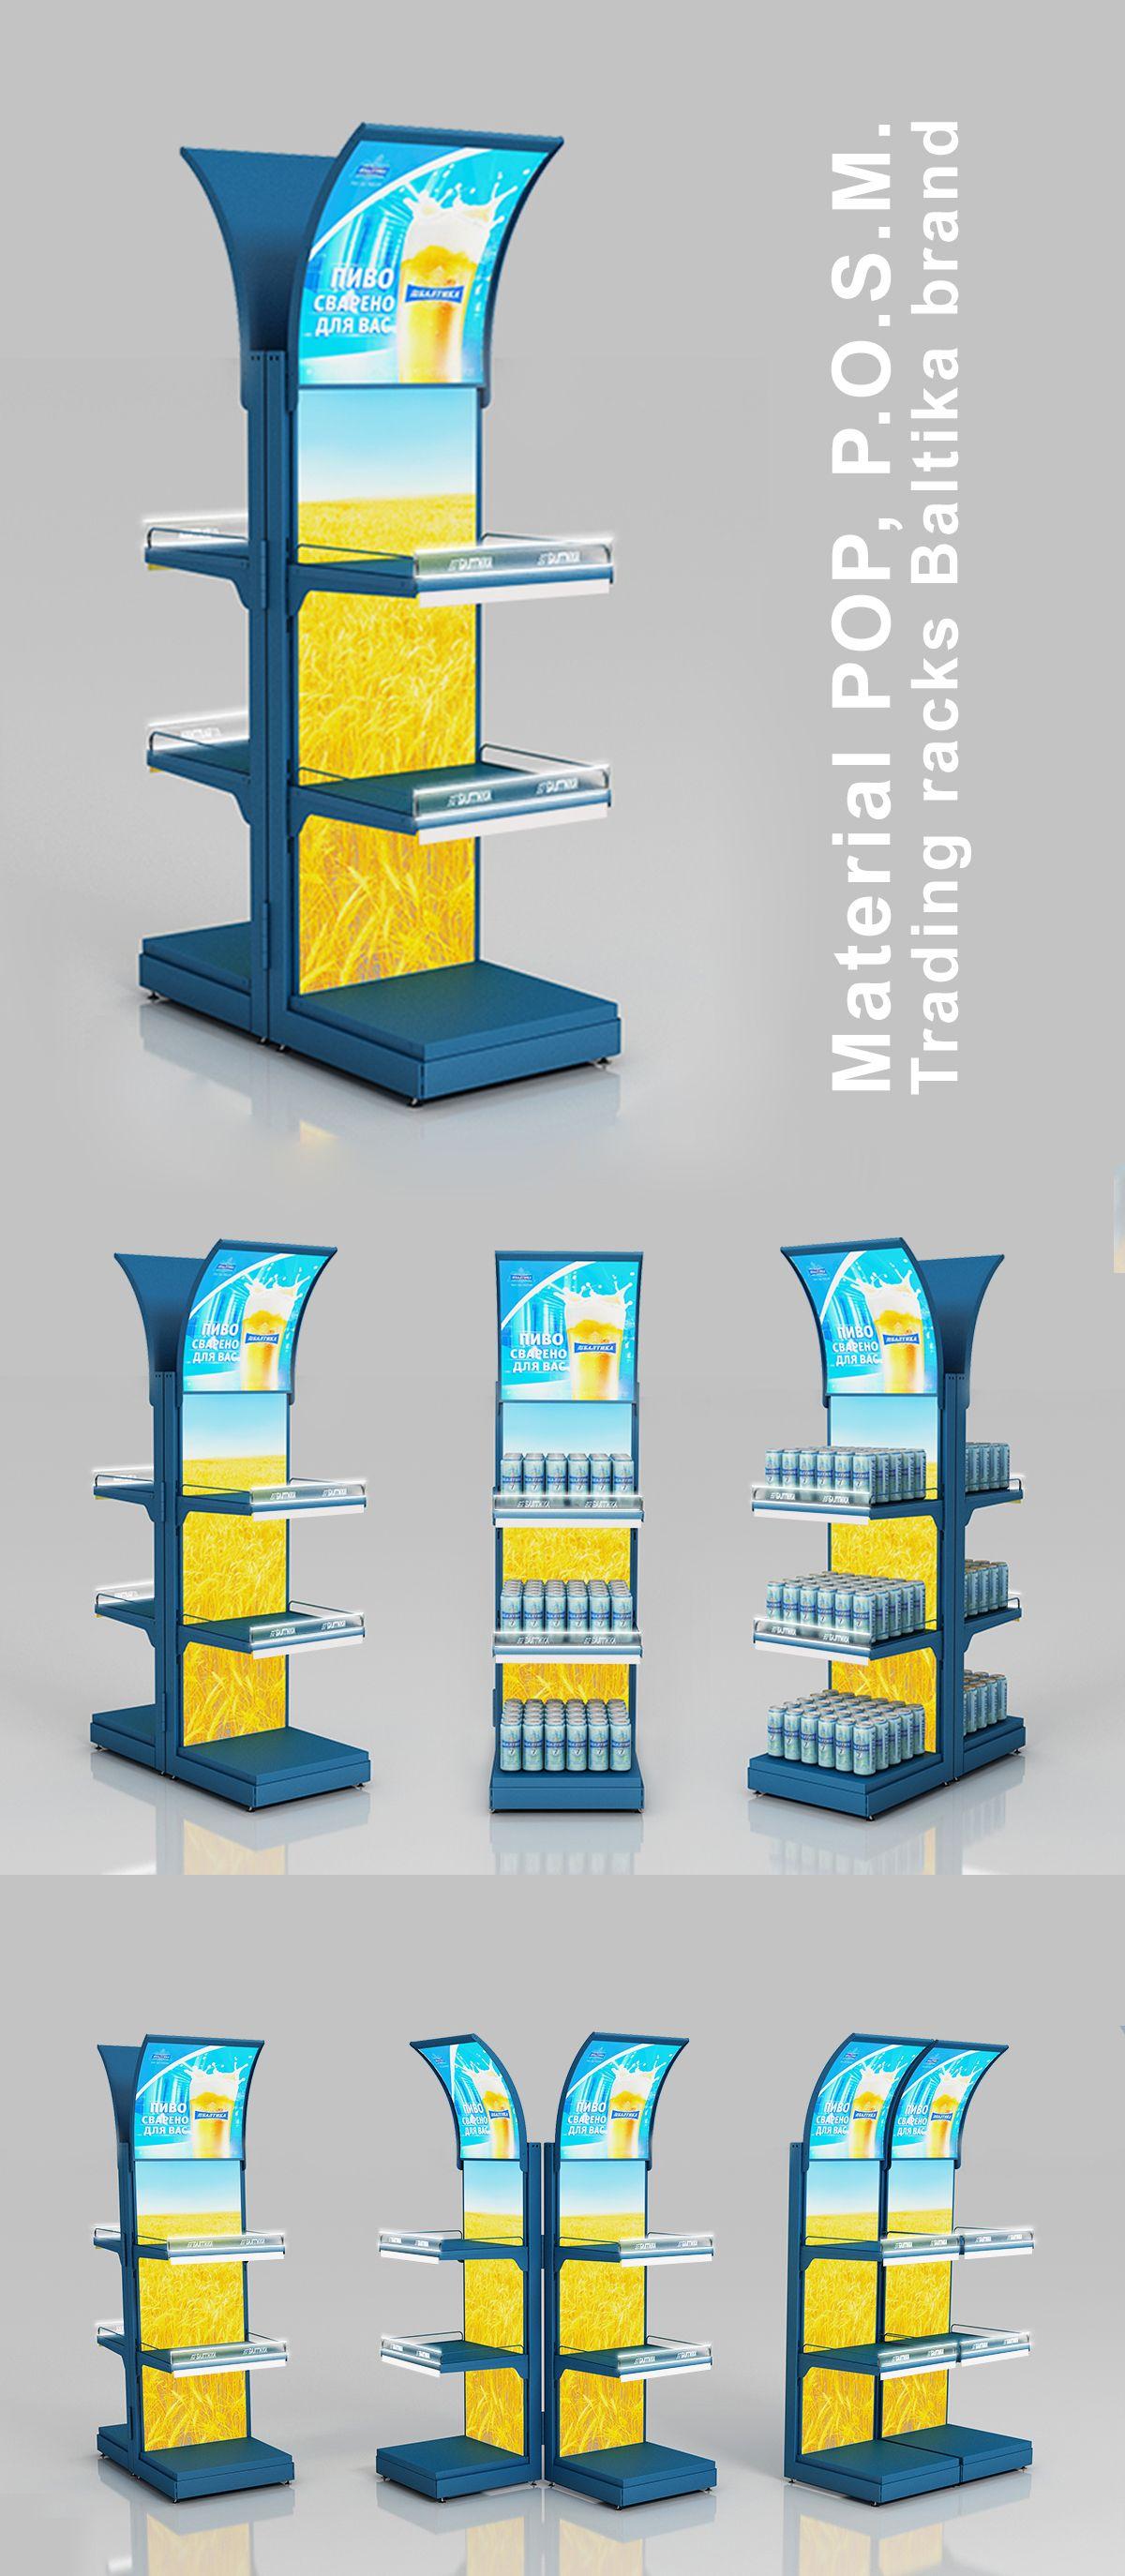 Posm design sofy posm design - Point Of Sale Point Of Purchase Design Pop Posm Pos Pop